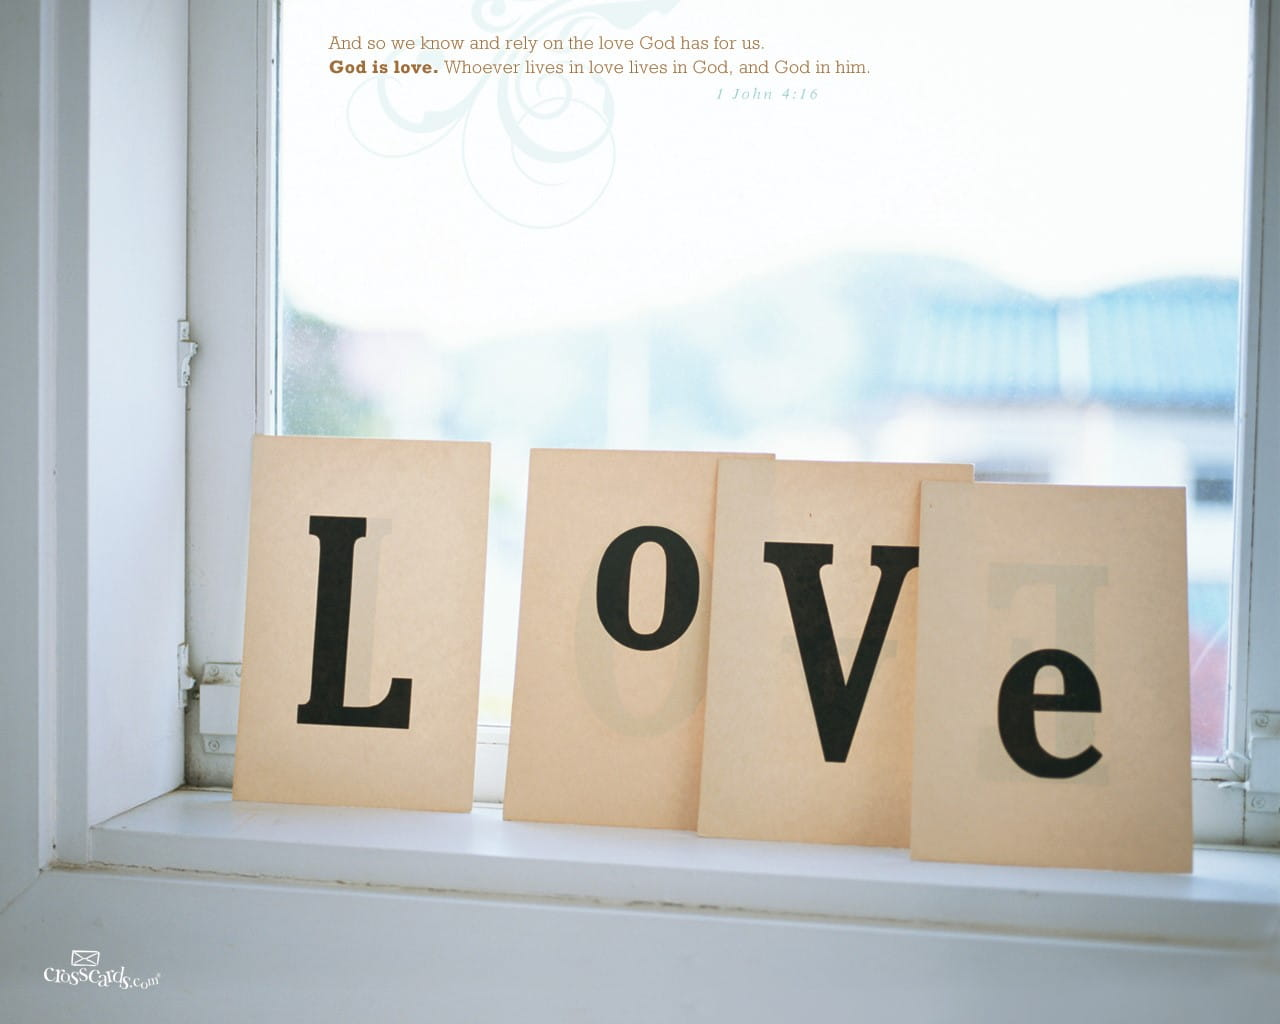 Top Wallpaper Love God - 24211-love-2-1280-x-1024  Trends_242485.jpg